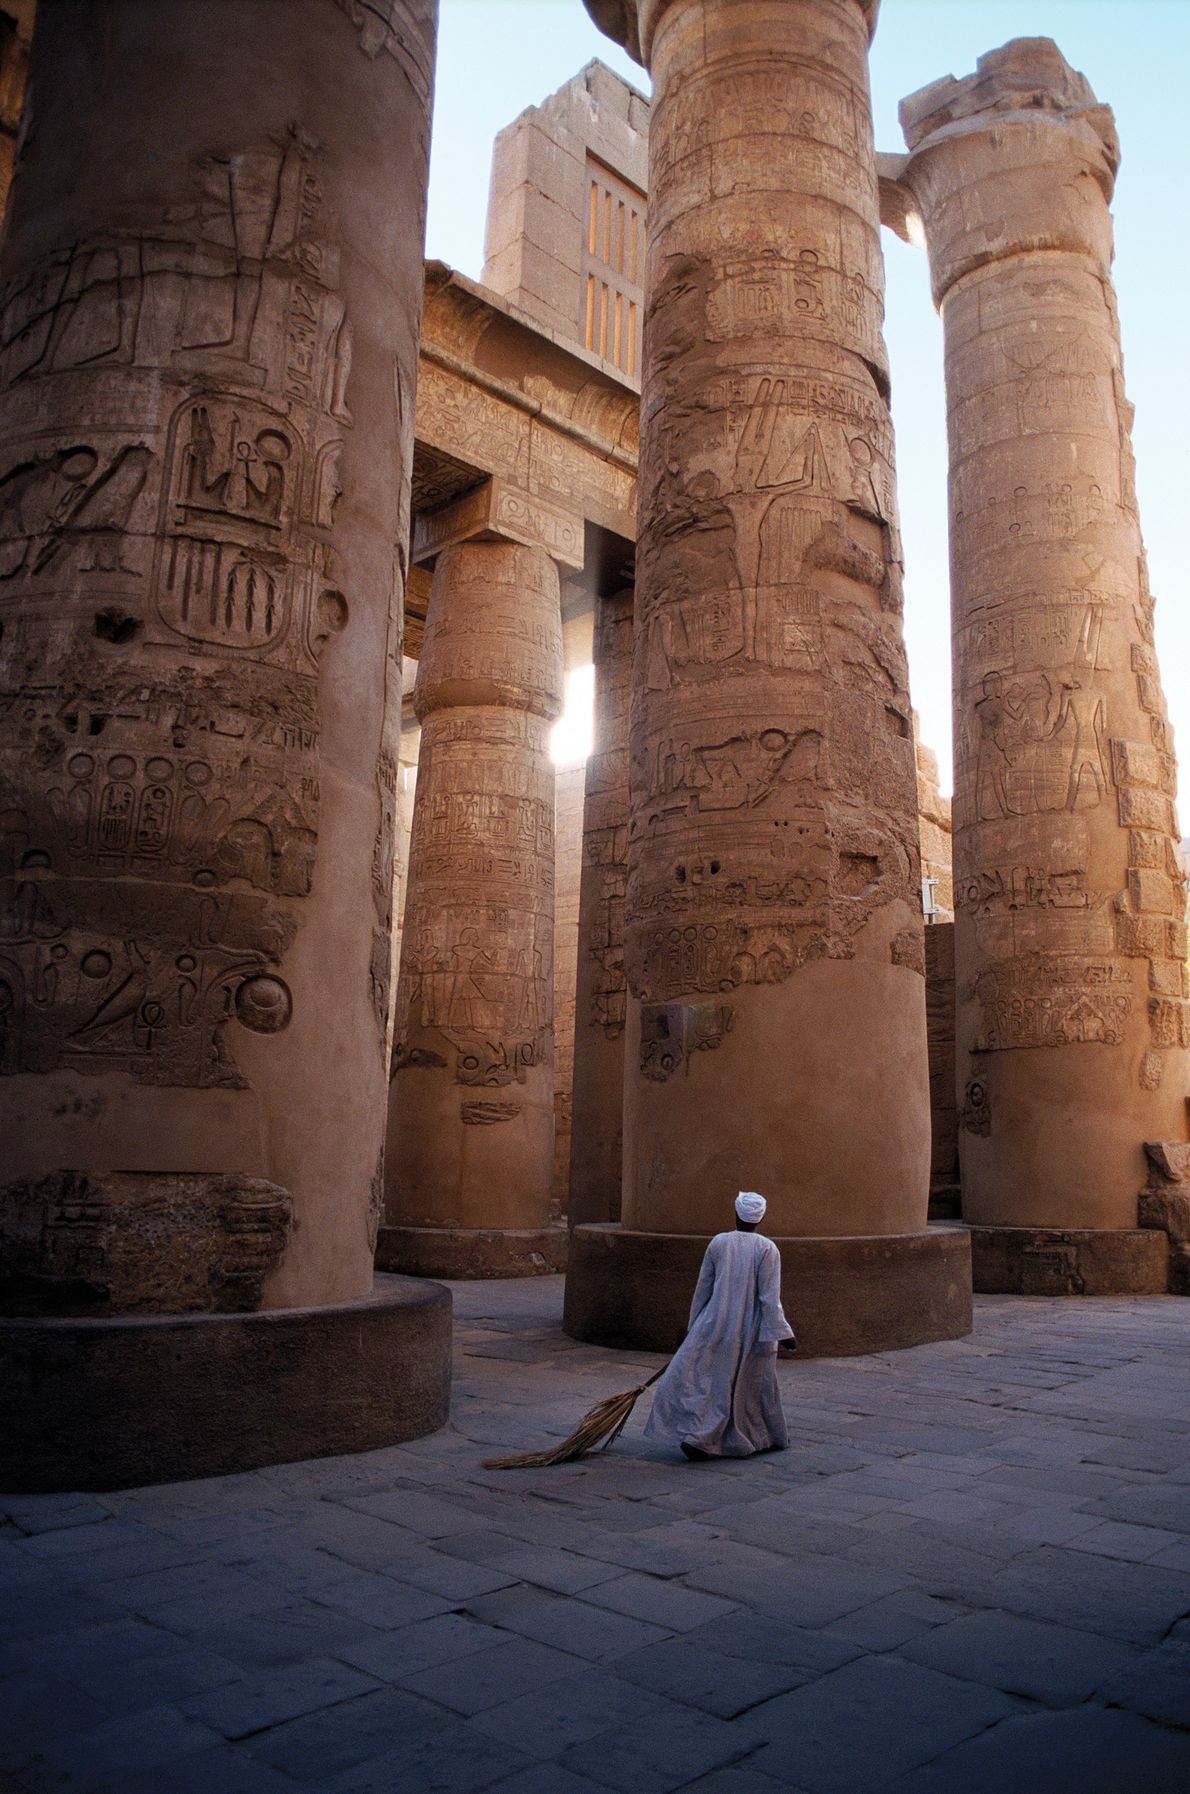 Nile Valley, Egypt